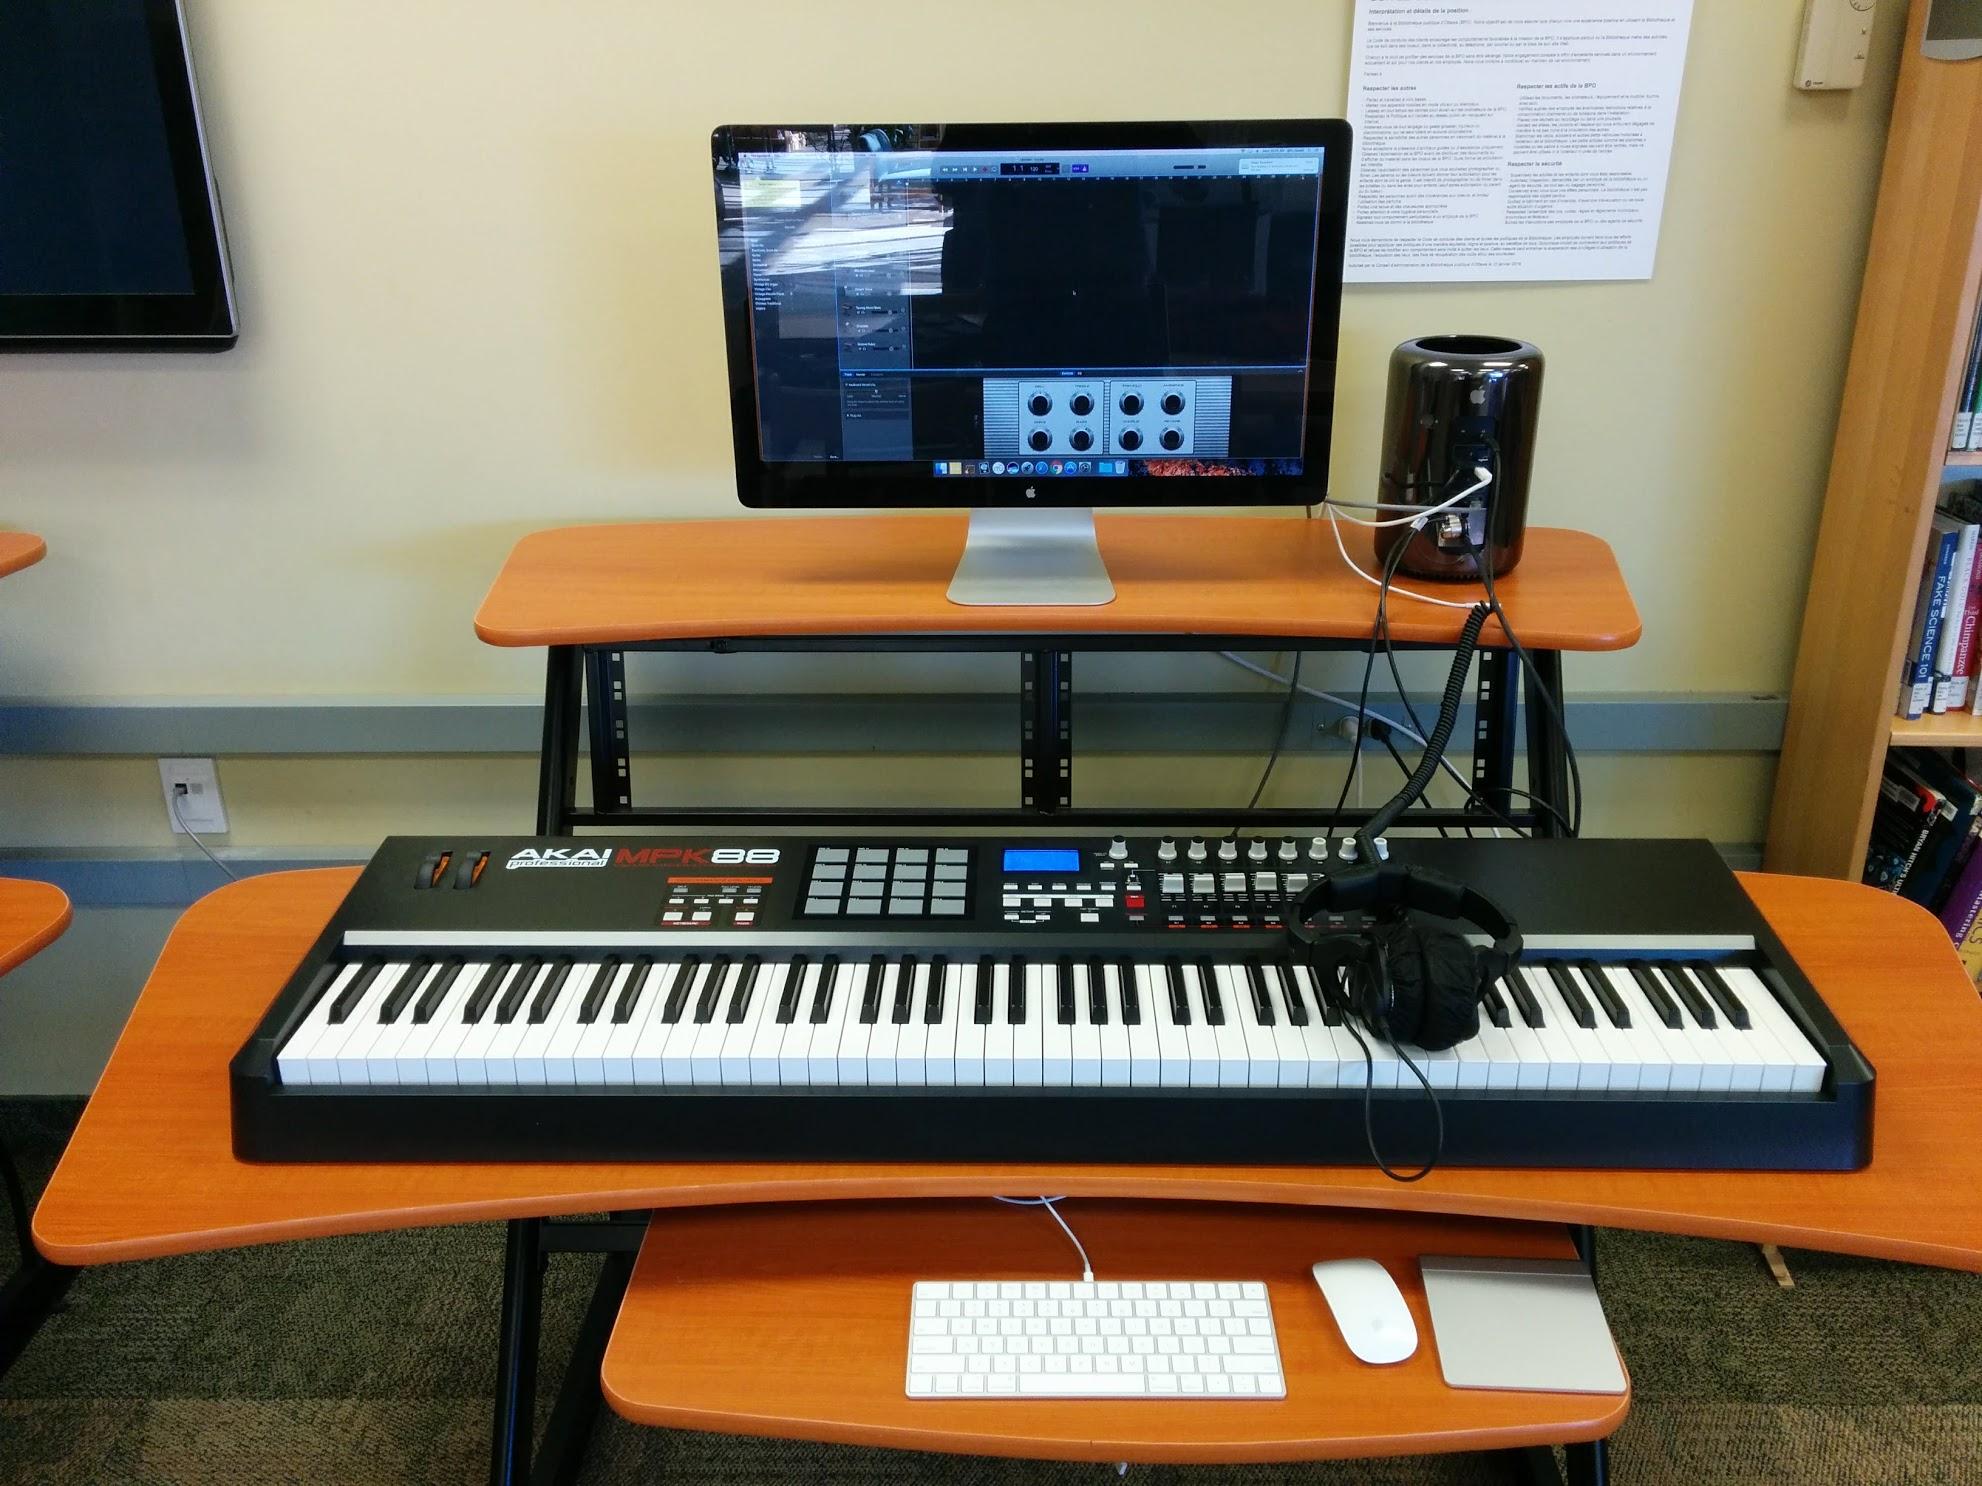 Computer workstation with midi keyboard